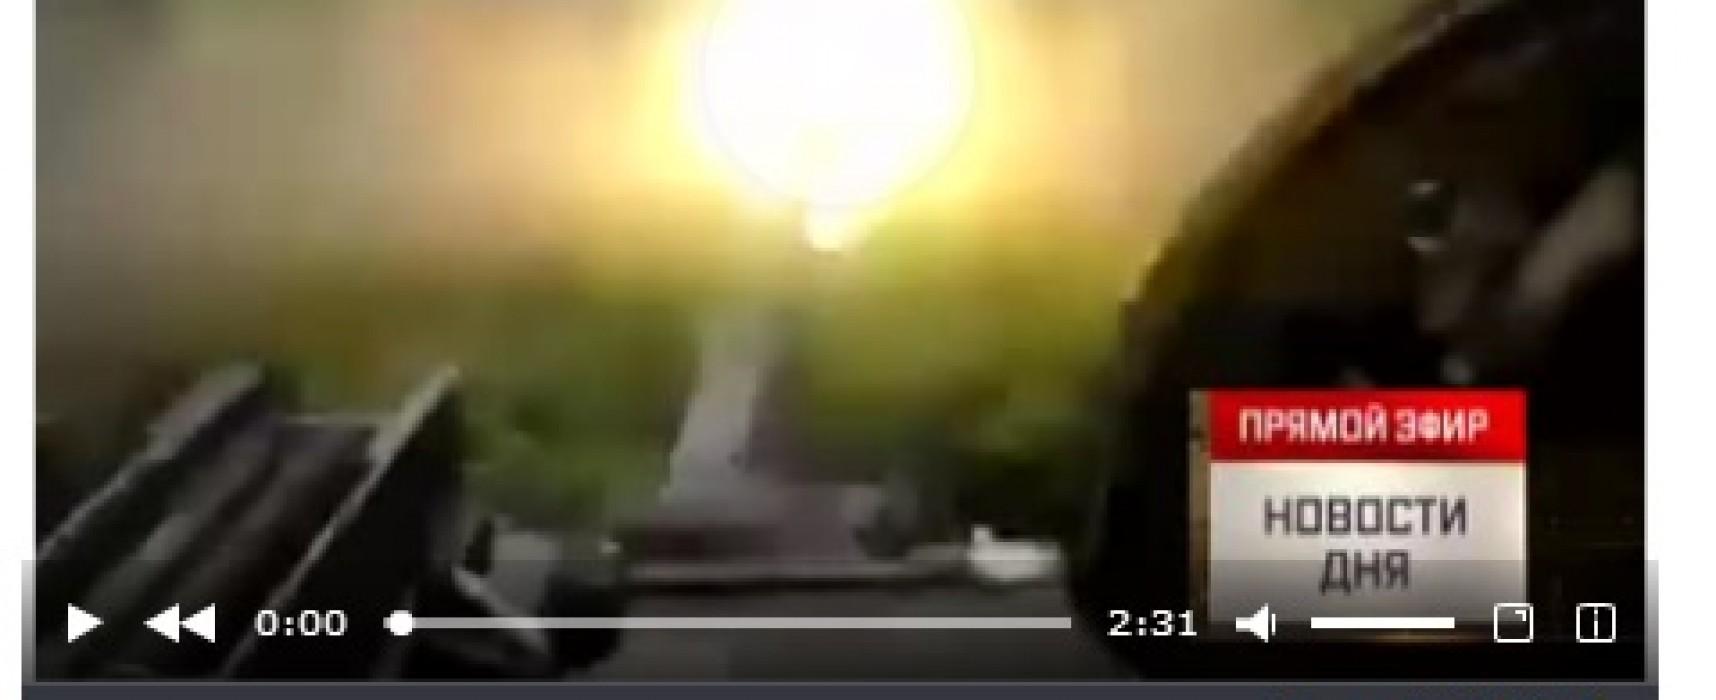 "El canal ""Zvezda"" falsificó el vídeo del tiroteo en Gorlivka"